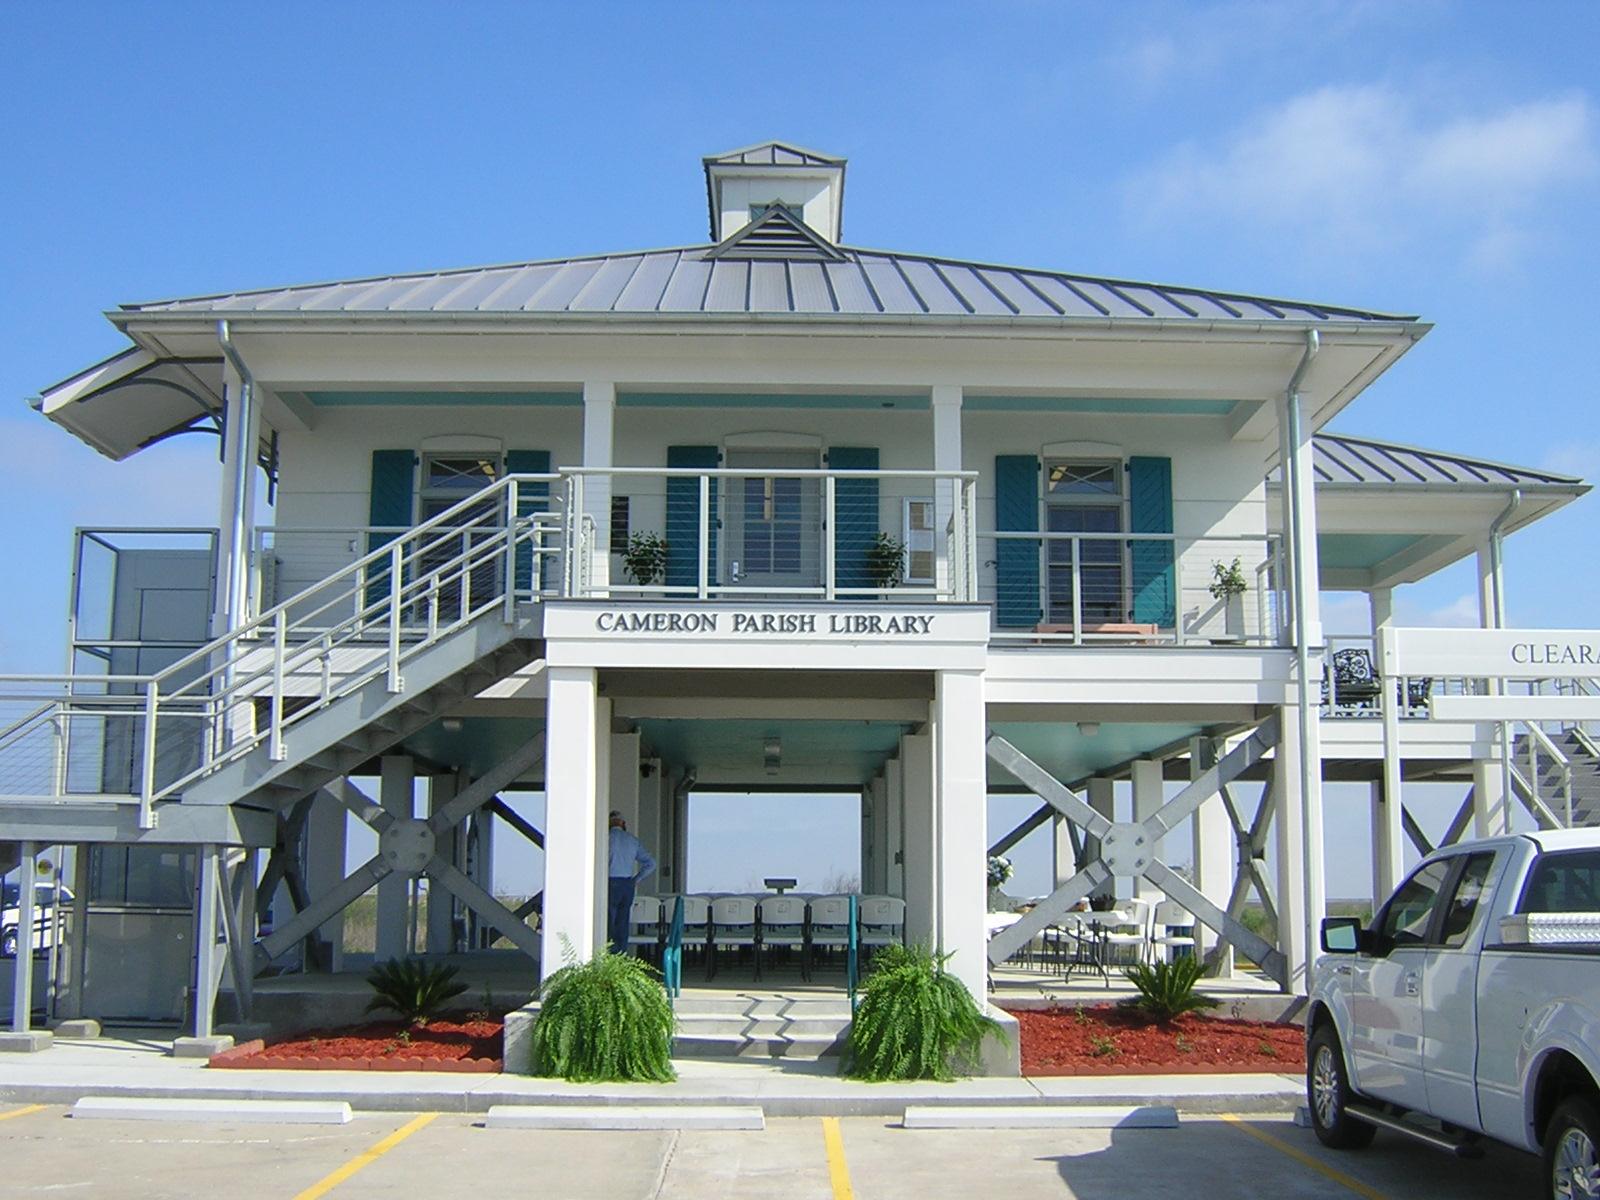 Cameron Parish Library - Johnson Bayou Branch